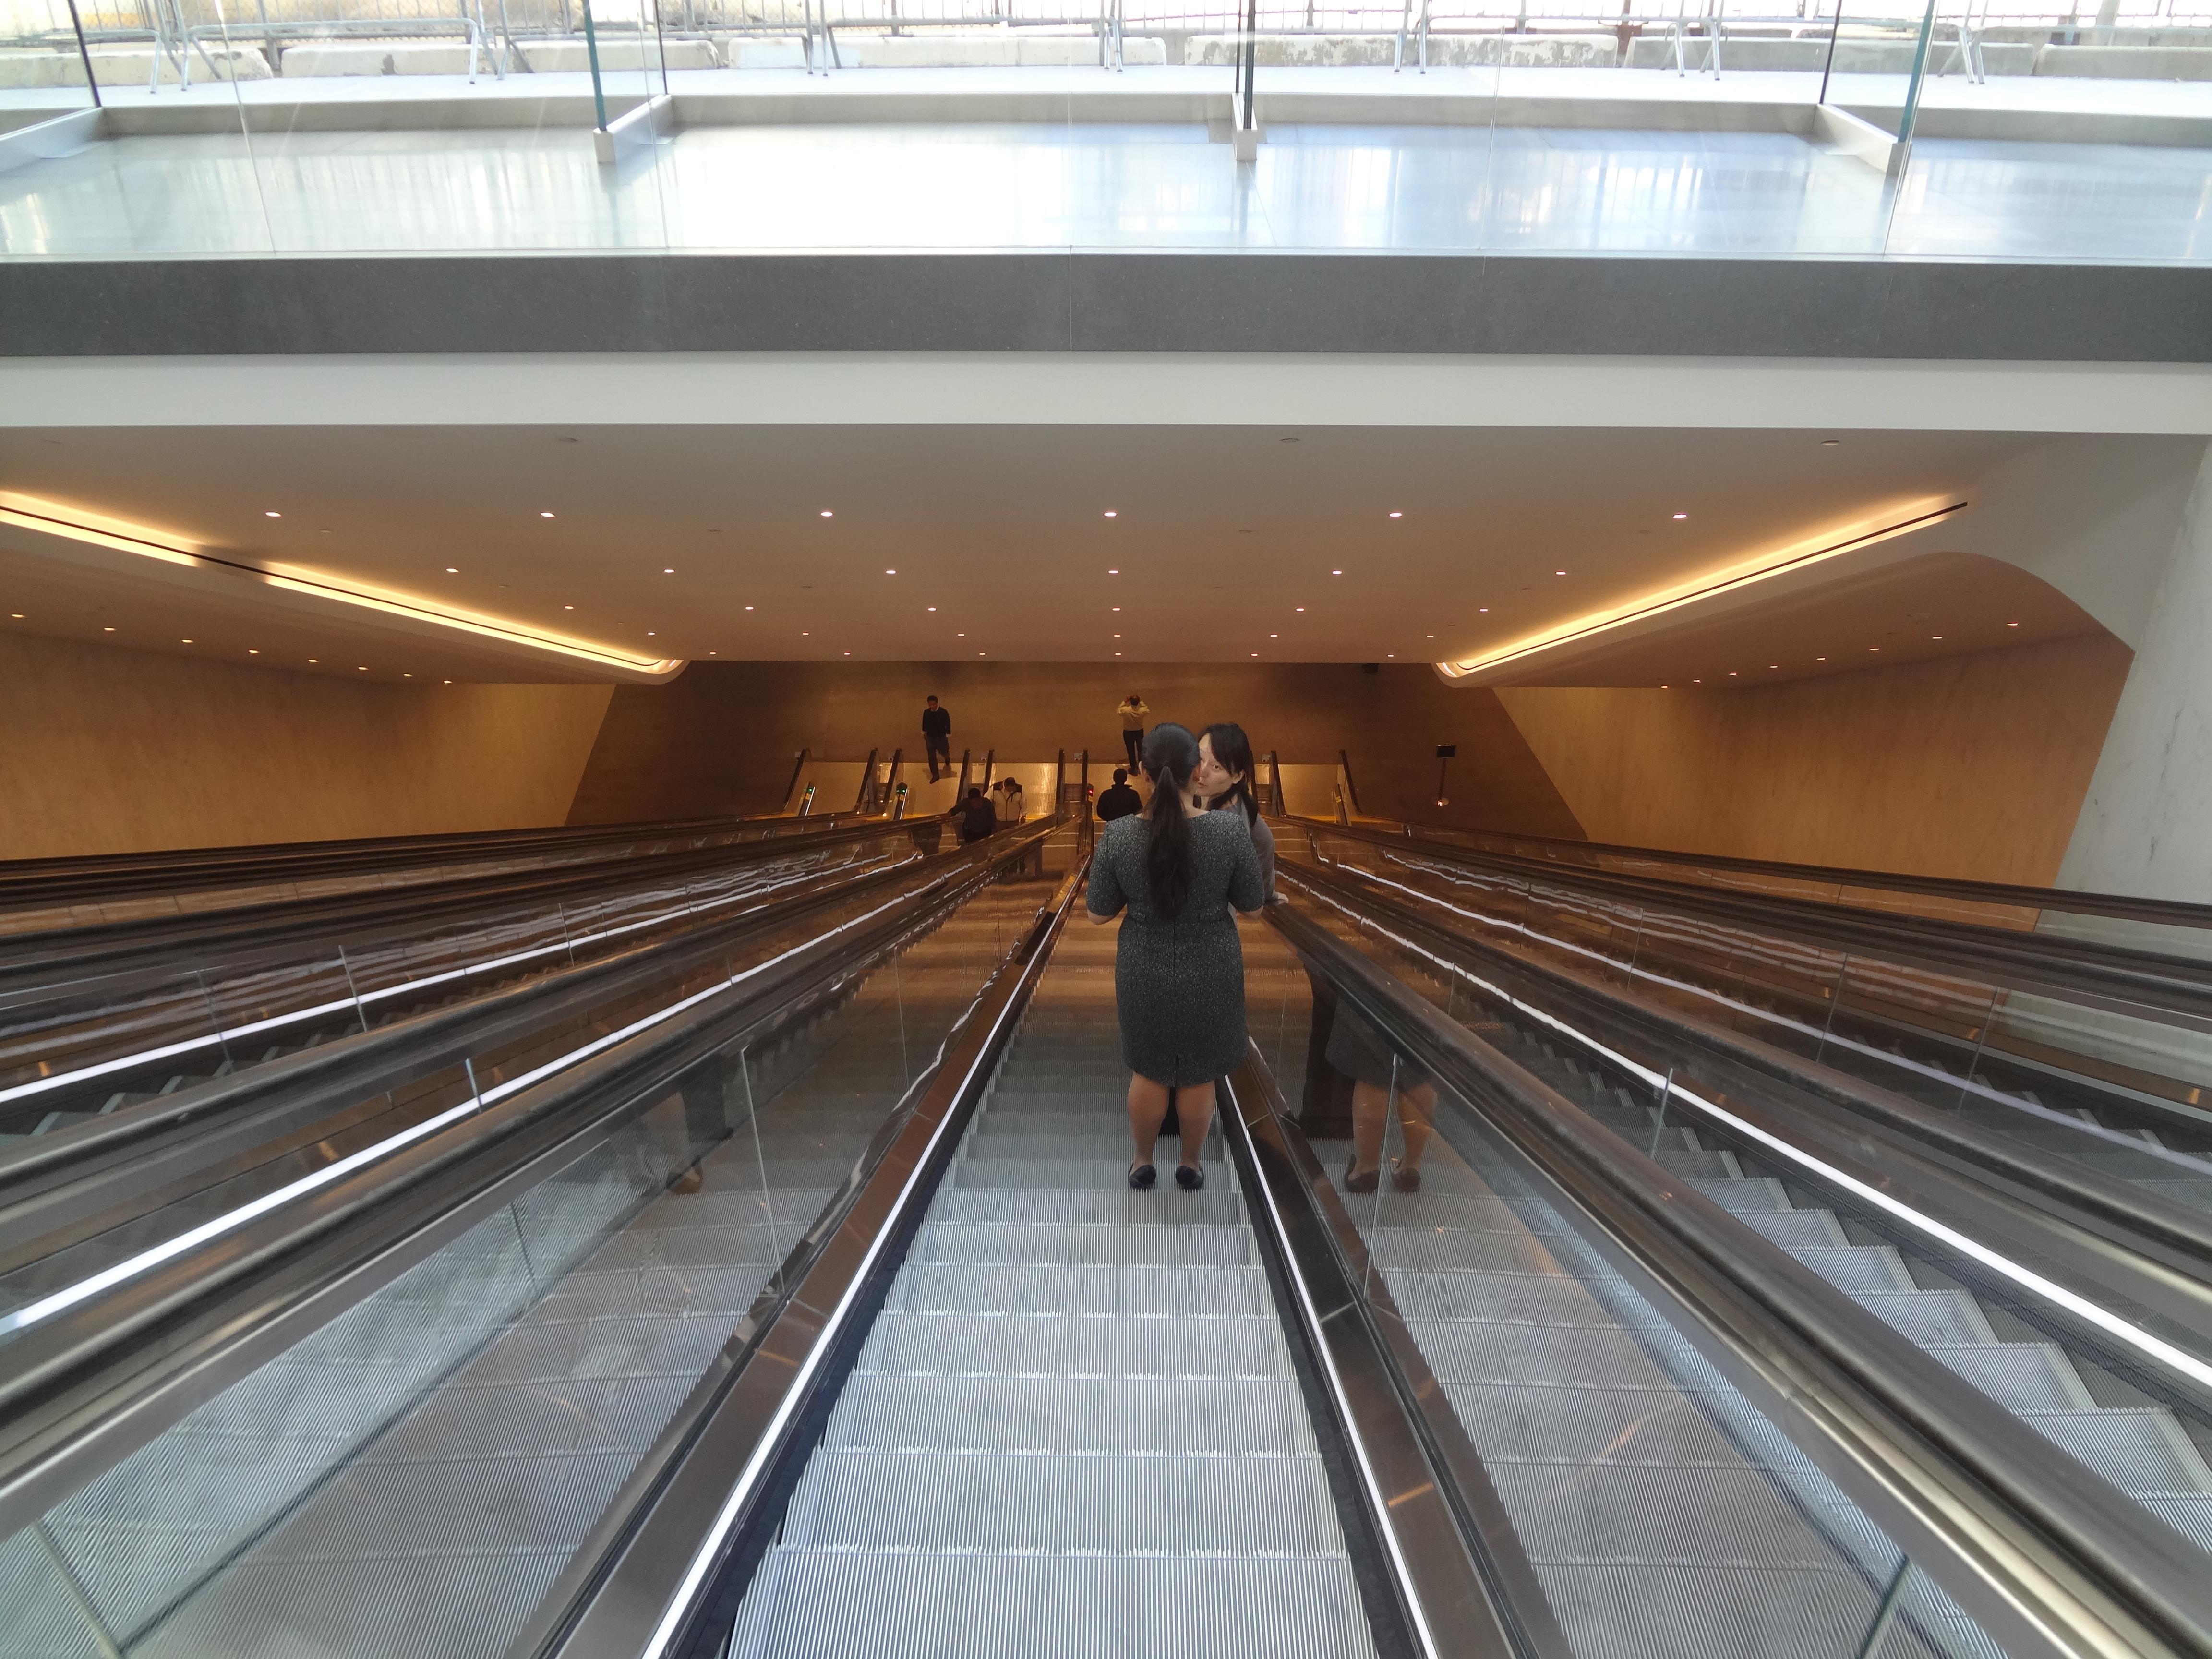 Brookfield escalators going down